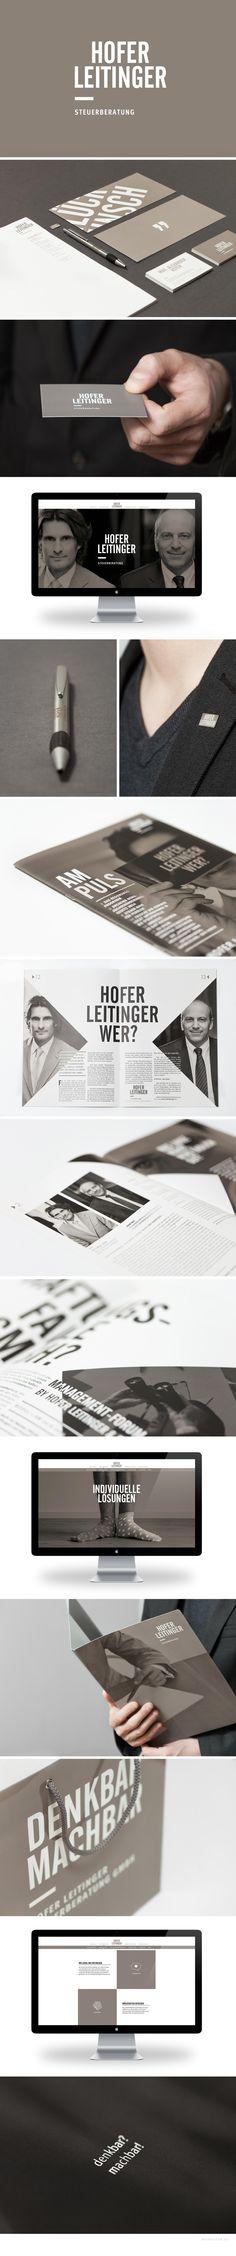 Corporate Design for Hofer Leitinger Steuerberatung by Nicouleur #branding #graz #design #austria #nicouleur #corporatedesign #taupe Corporate Design, Graphic Design Typography, Web Design, Logos, Accessories, Graz, Design Web, Logo, A Logo